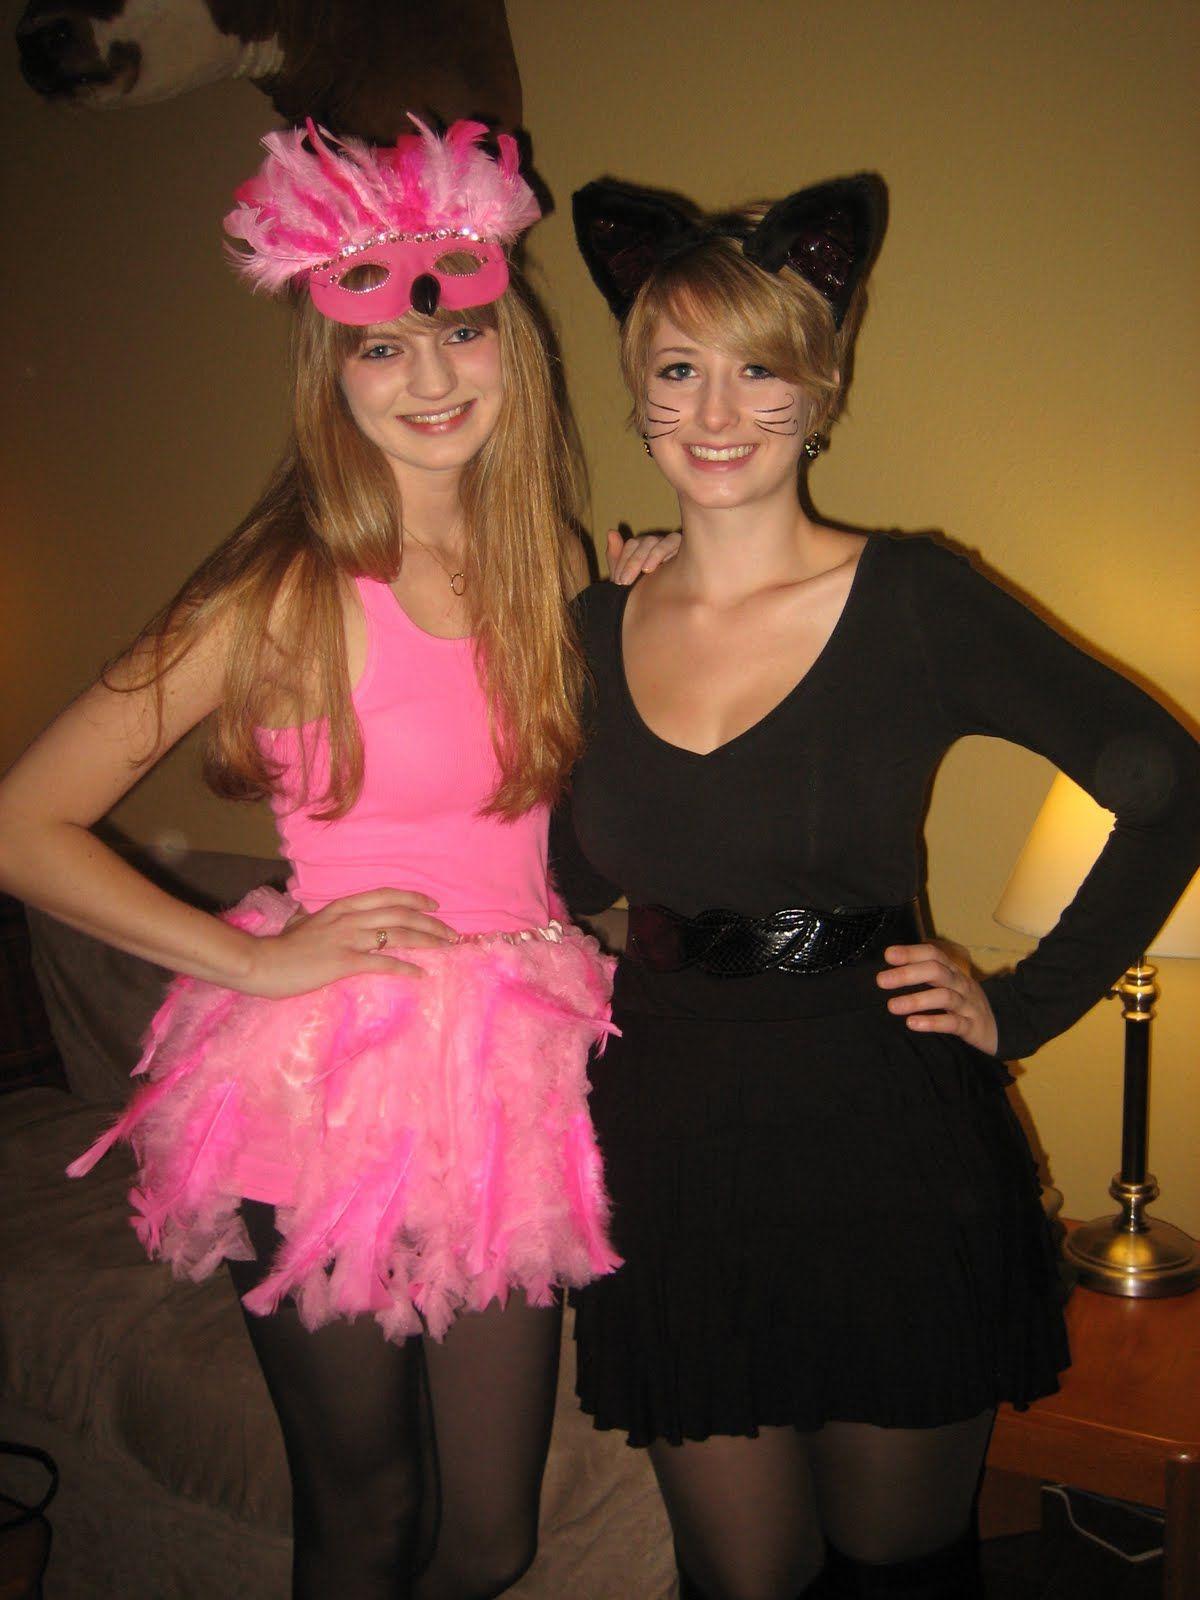 Pink Tutu Halloween Costume Ideas | Pink Flamingo Black Cat Costume Ideas Costumes Pinterest